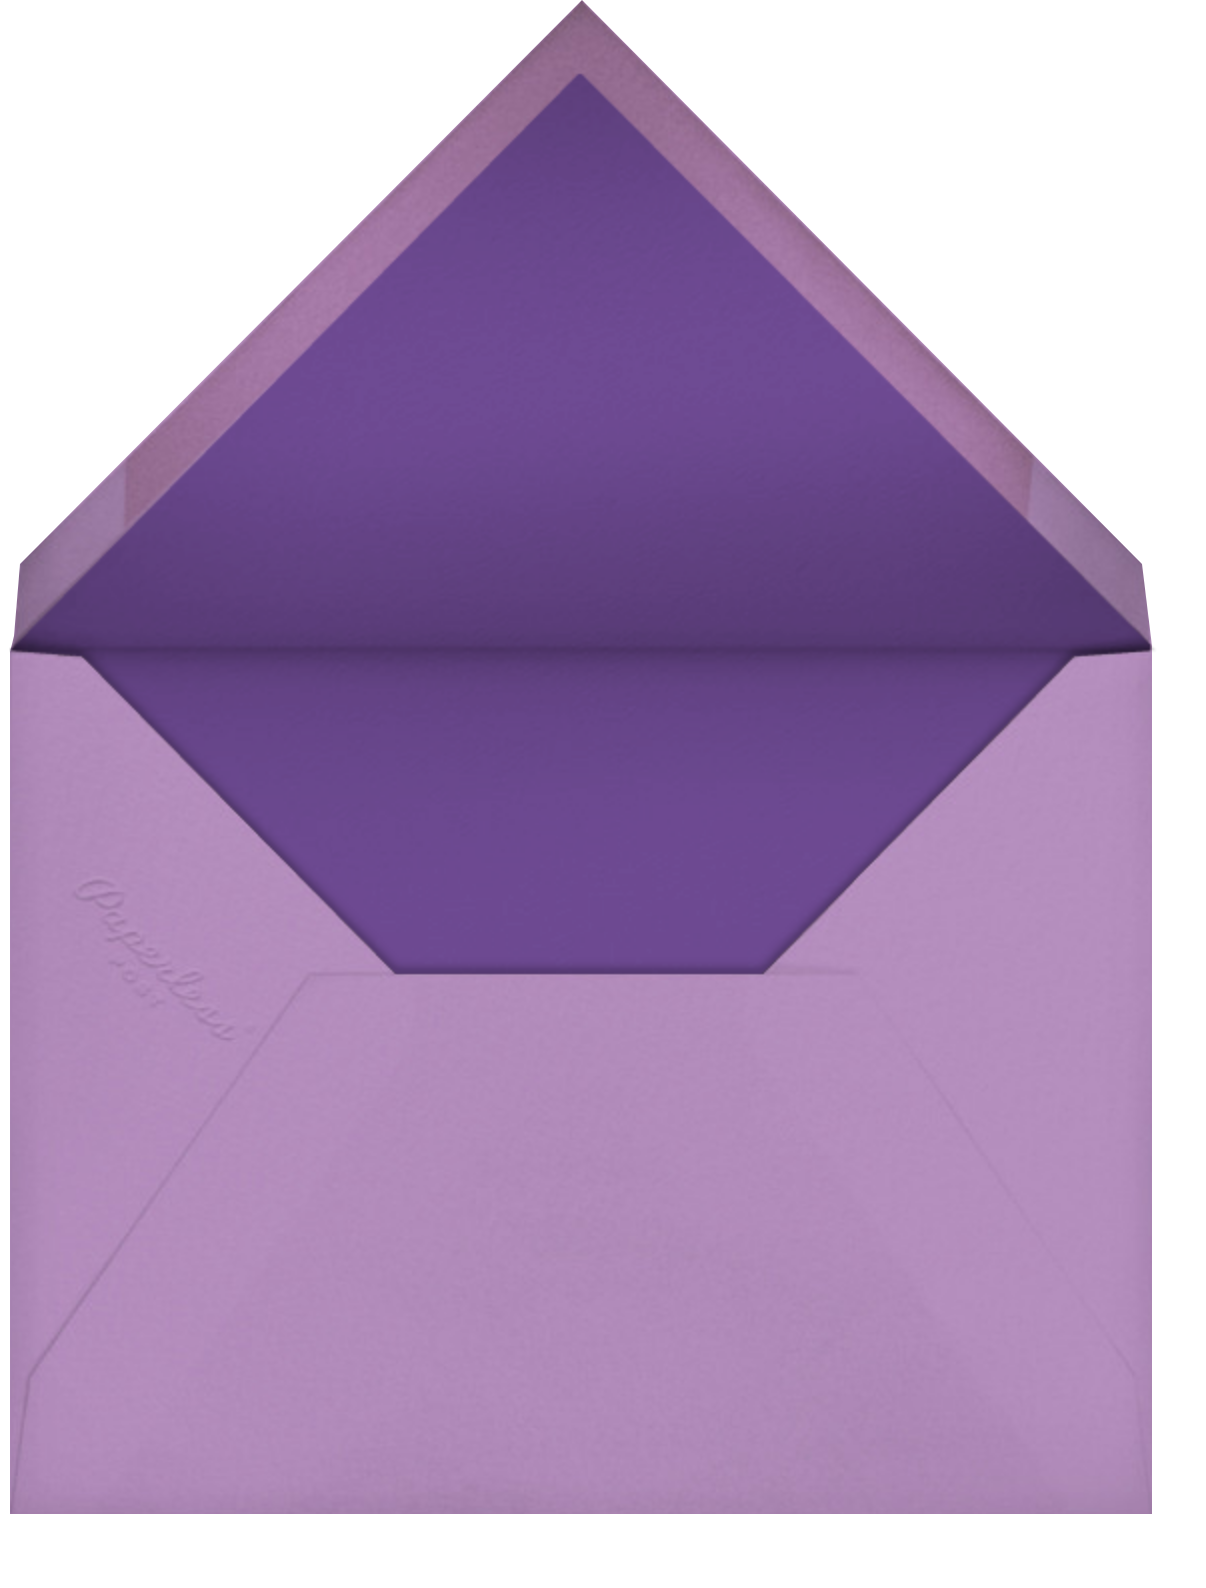 Oaxacan (Photo) - White - Paperless Post - Envelope